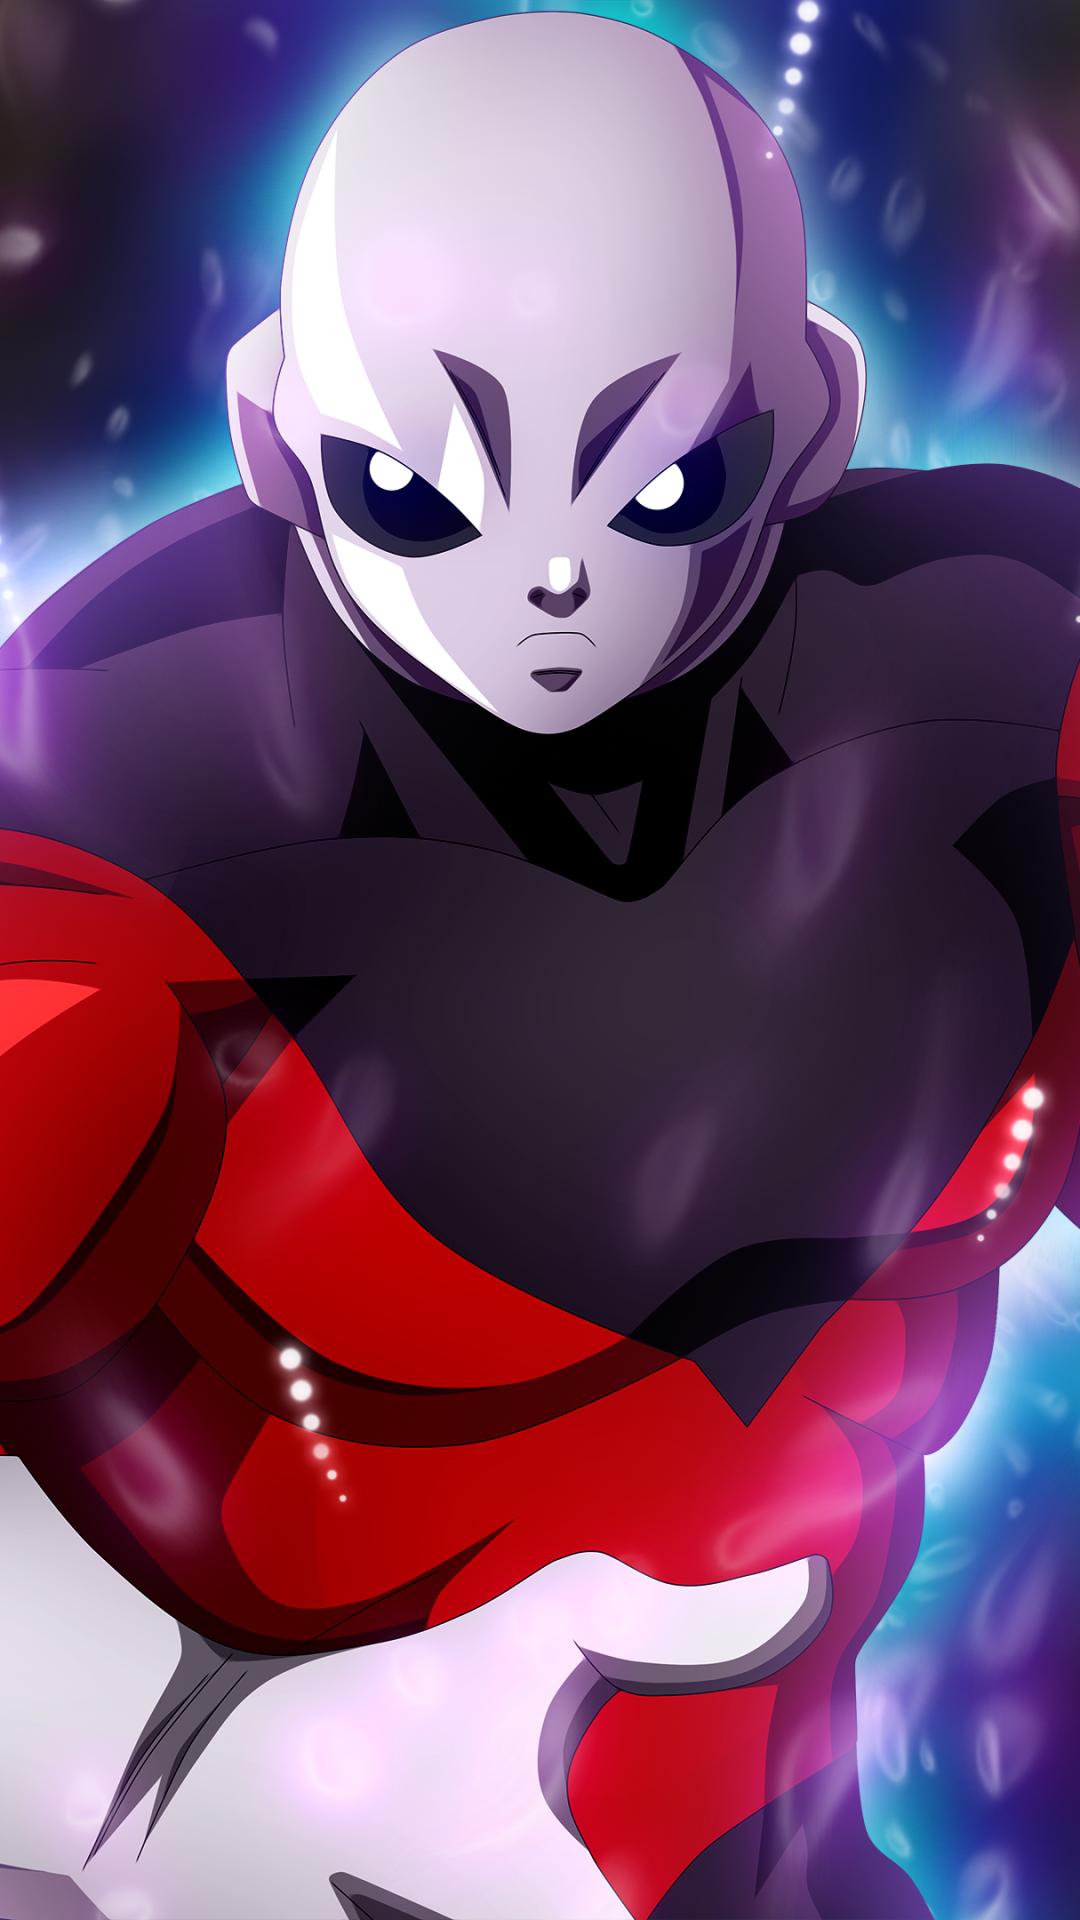 Anime dragon ball super 1080x1920 wallpaper id 701567 mobile abyss - Dragon ball super wallpaper 1080x1920 ...